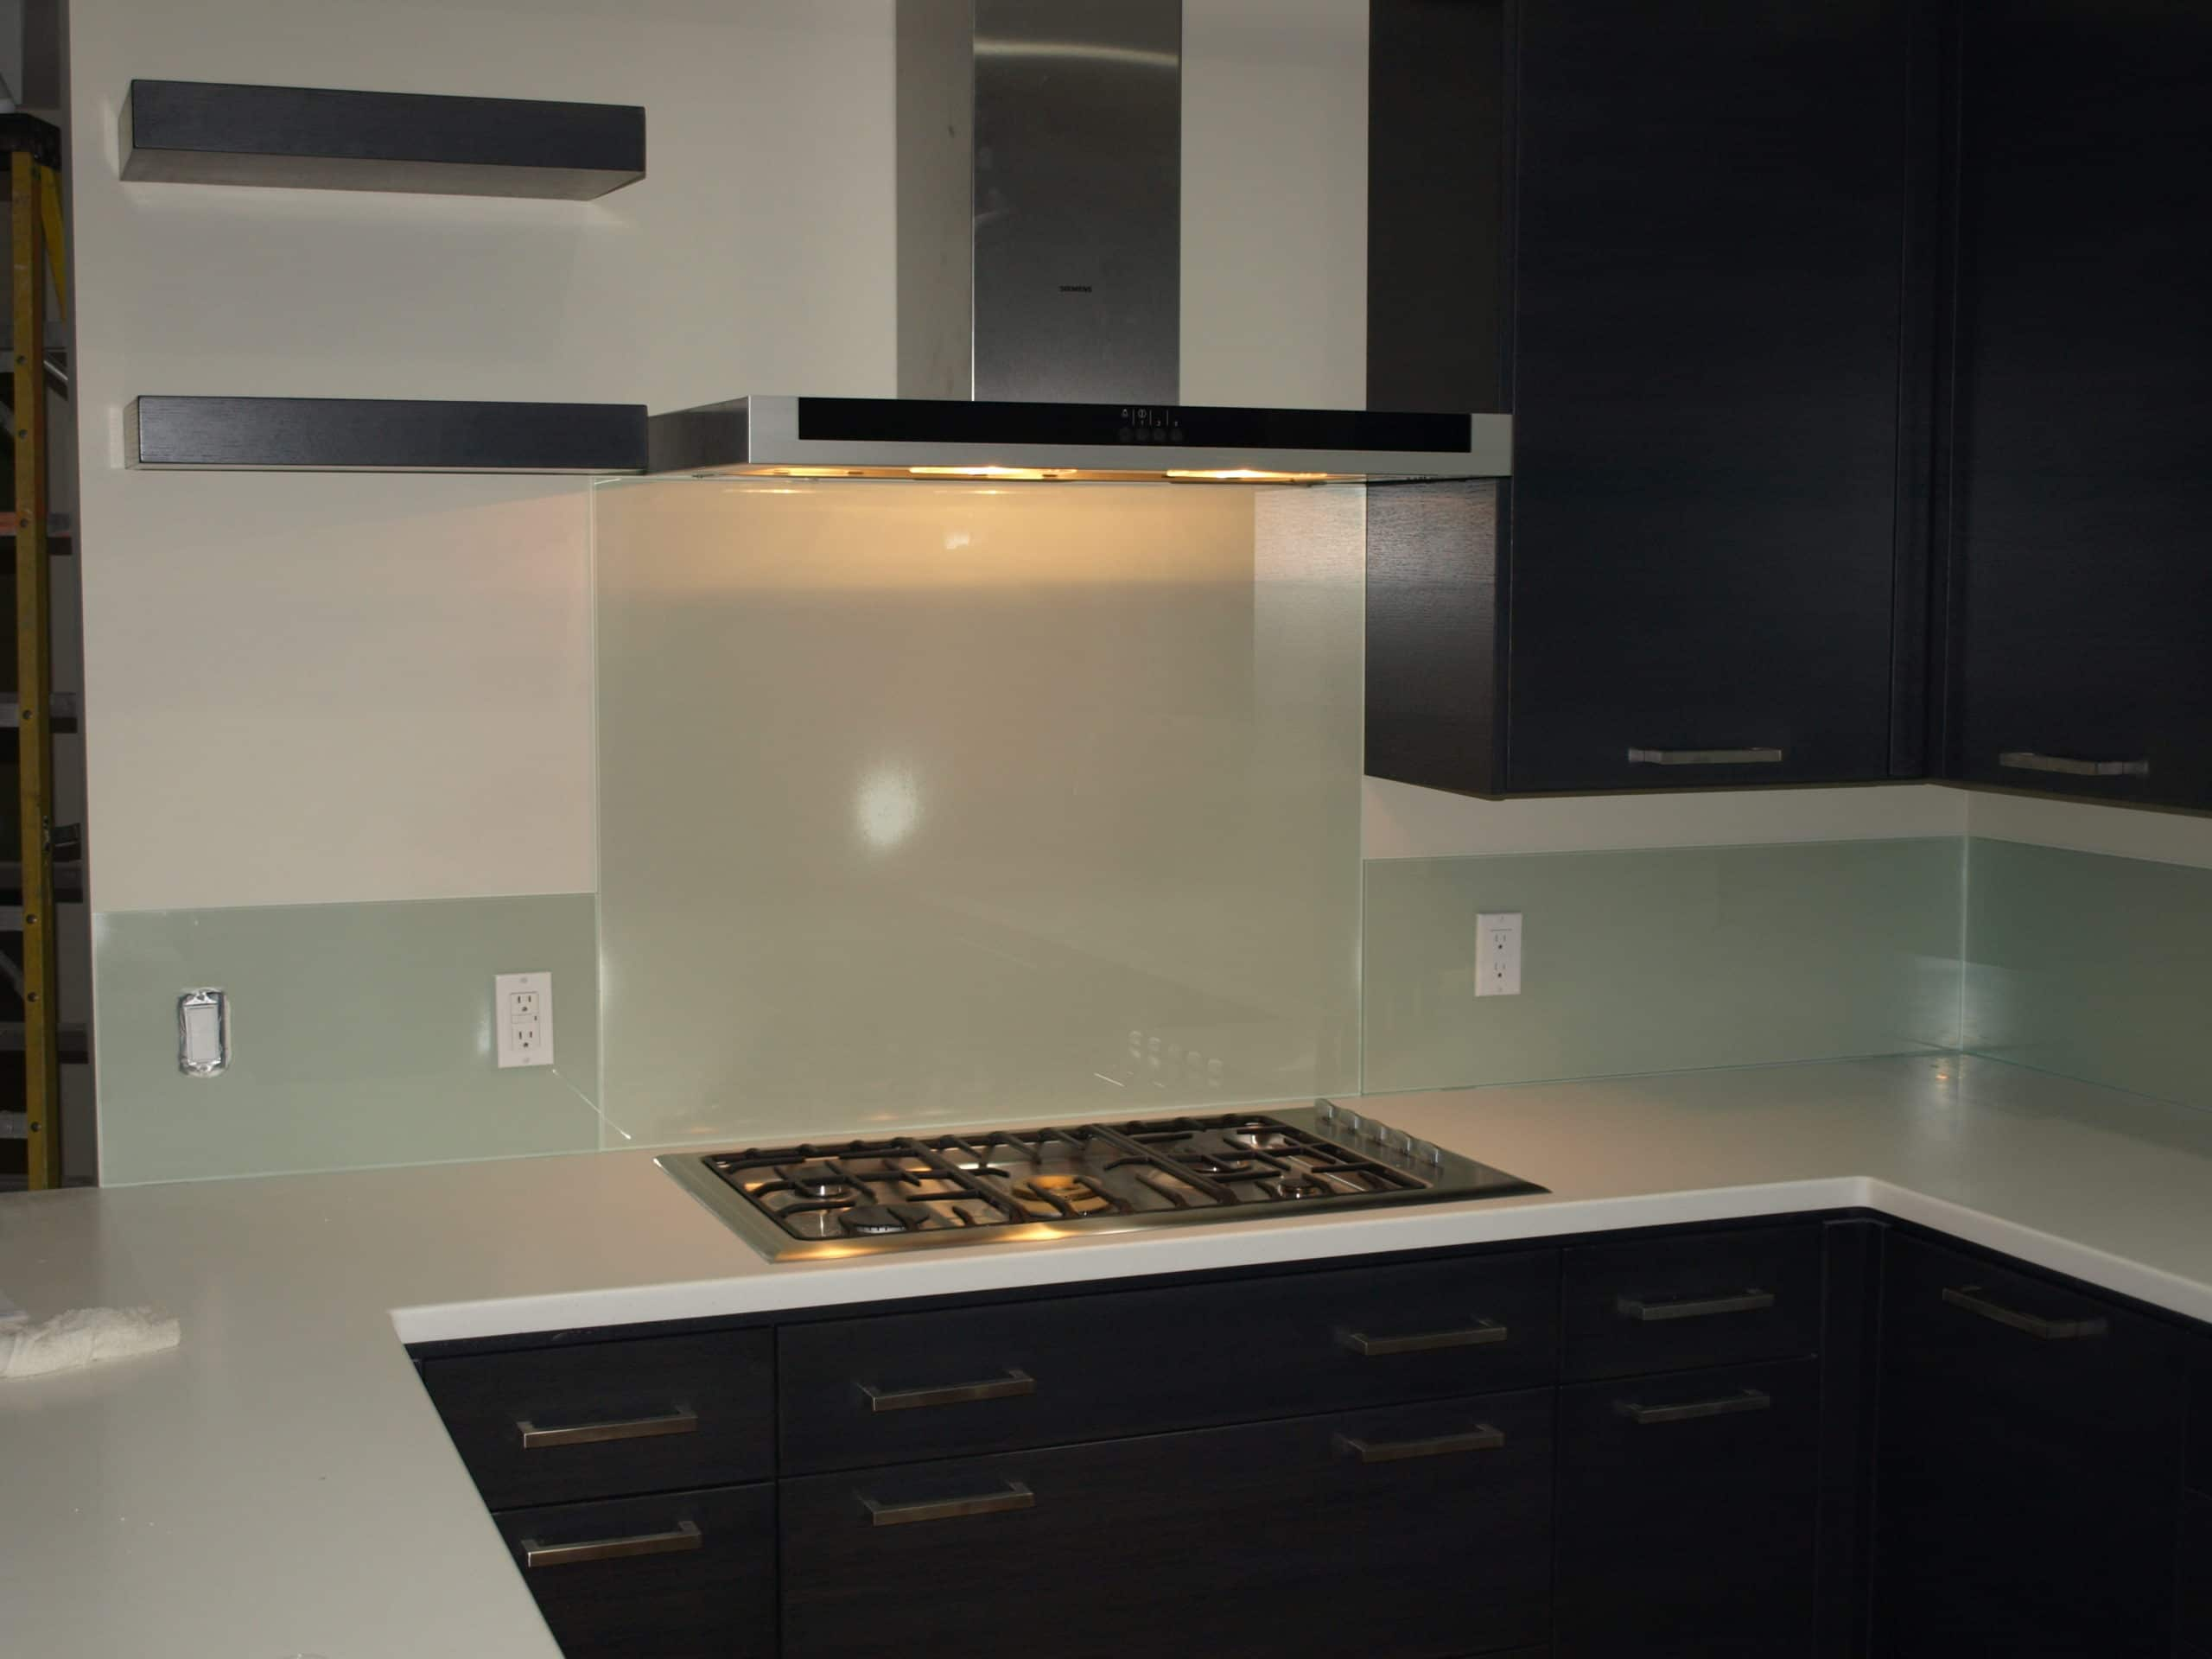 commercial kitchens top mount kitchen sinks backsplash glass - harbor all & mirror, inc.